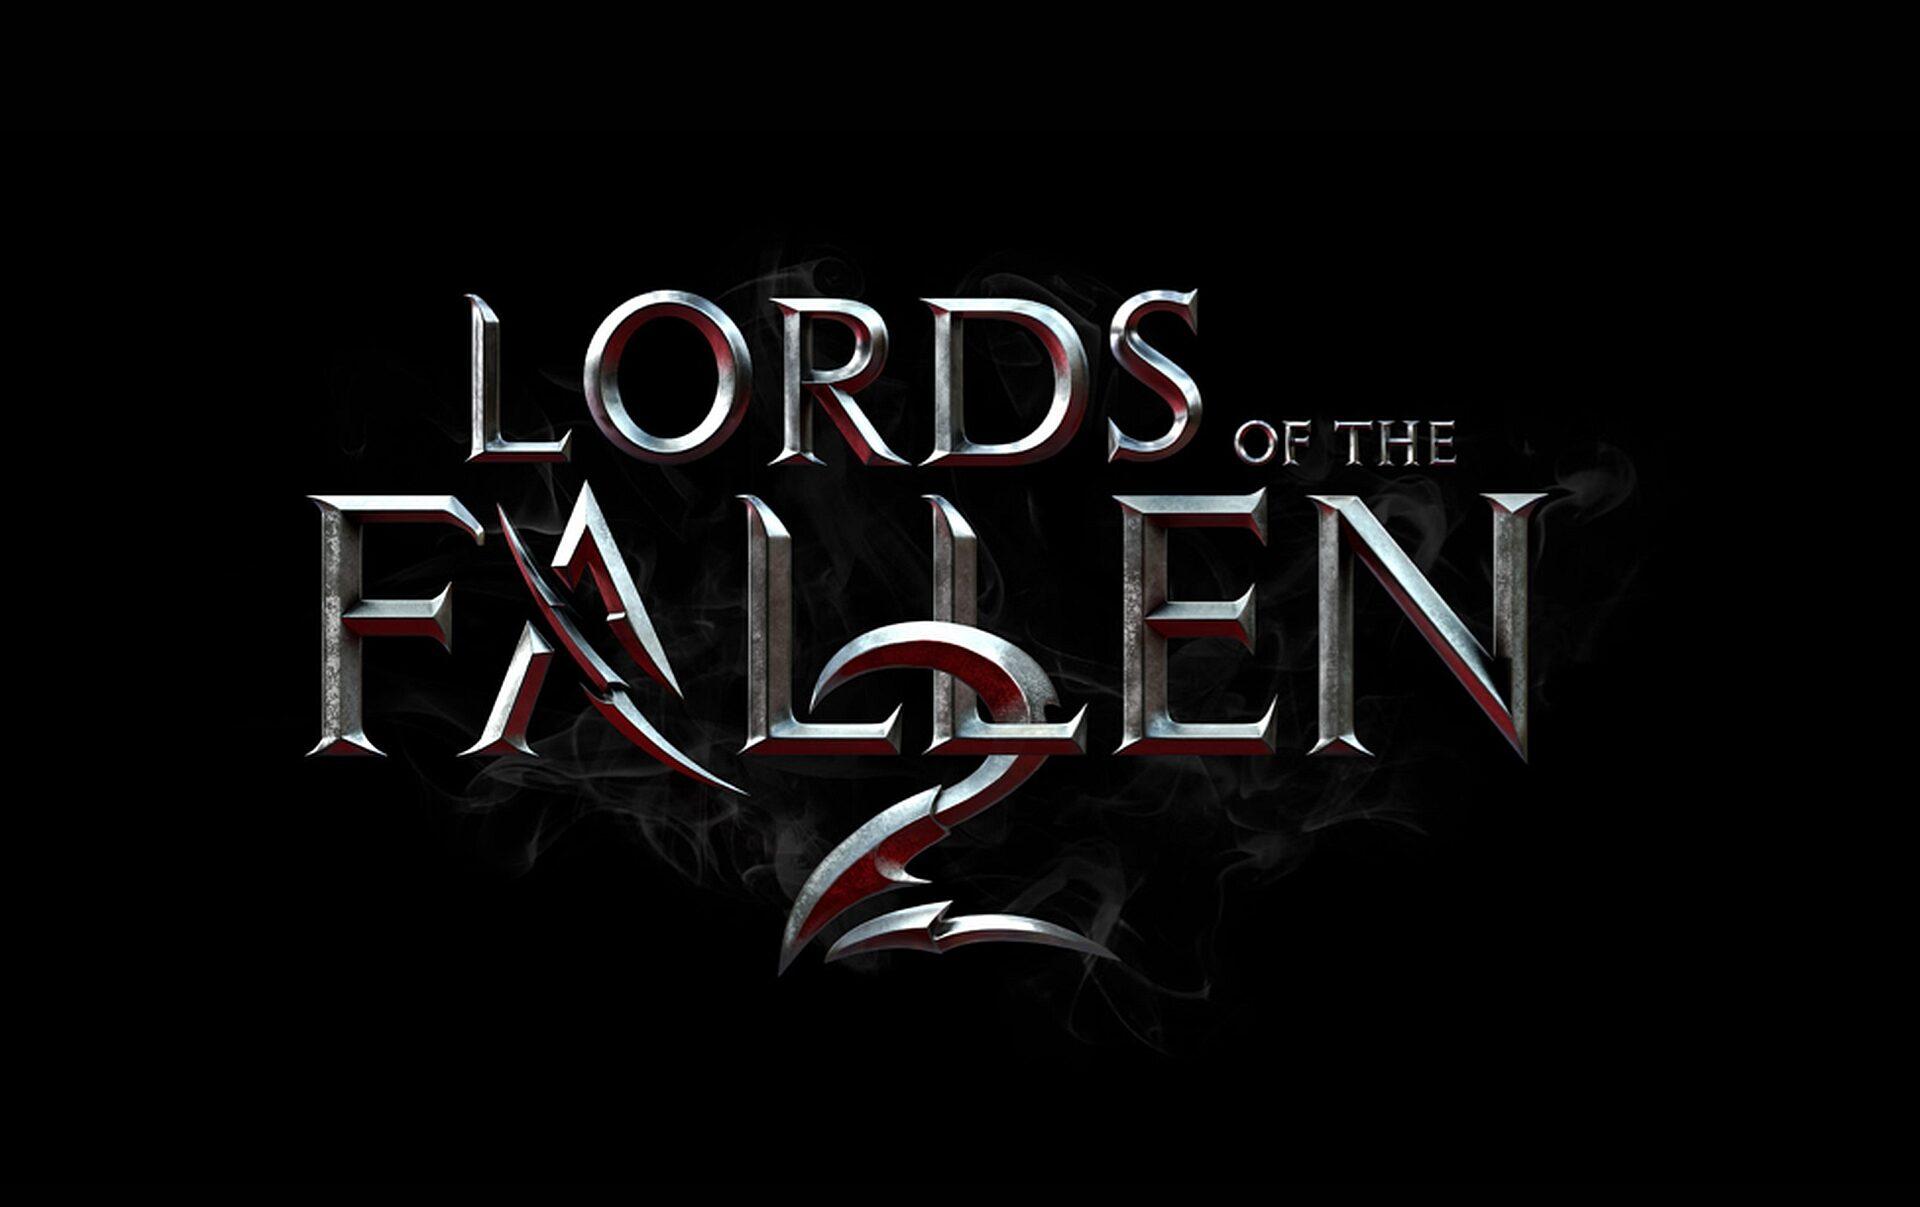 lords_of_the_fallen_2_8943585534.jpg